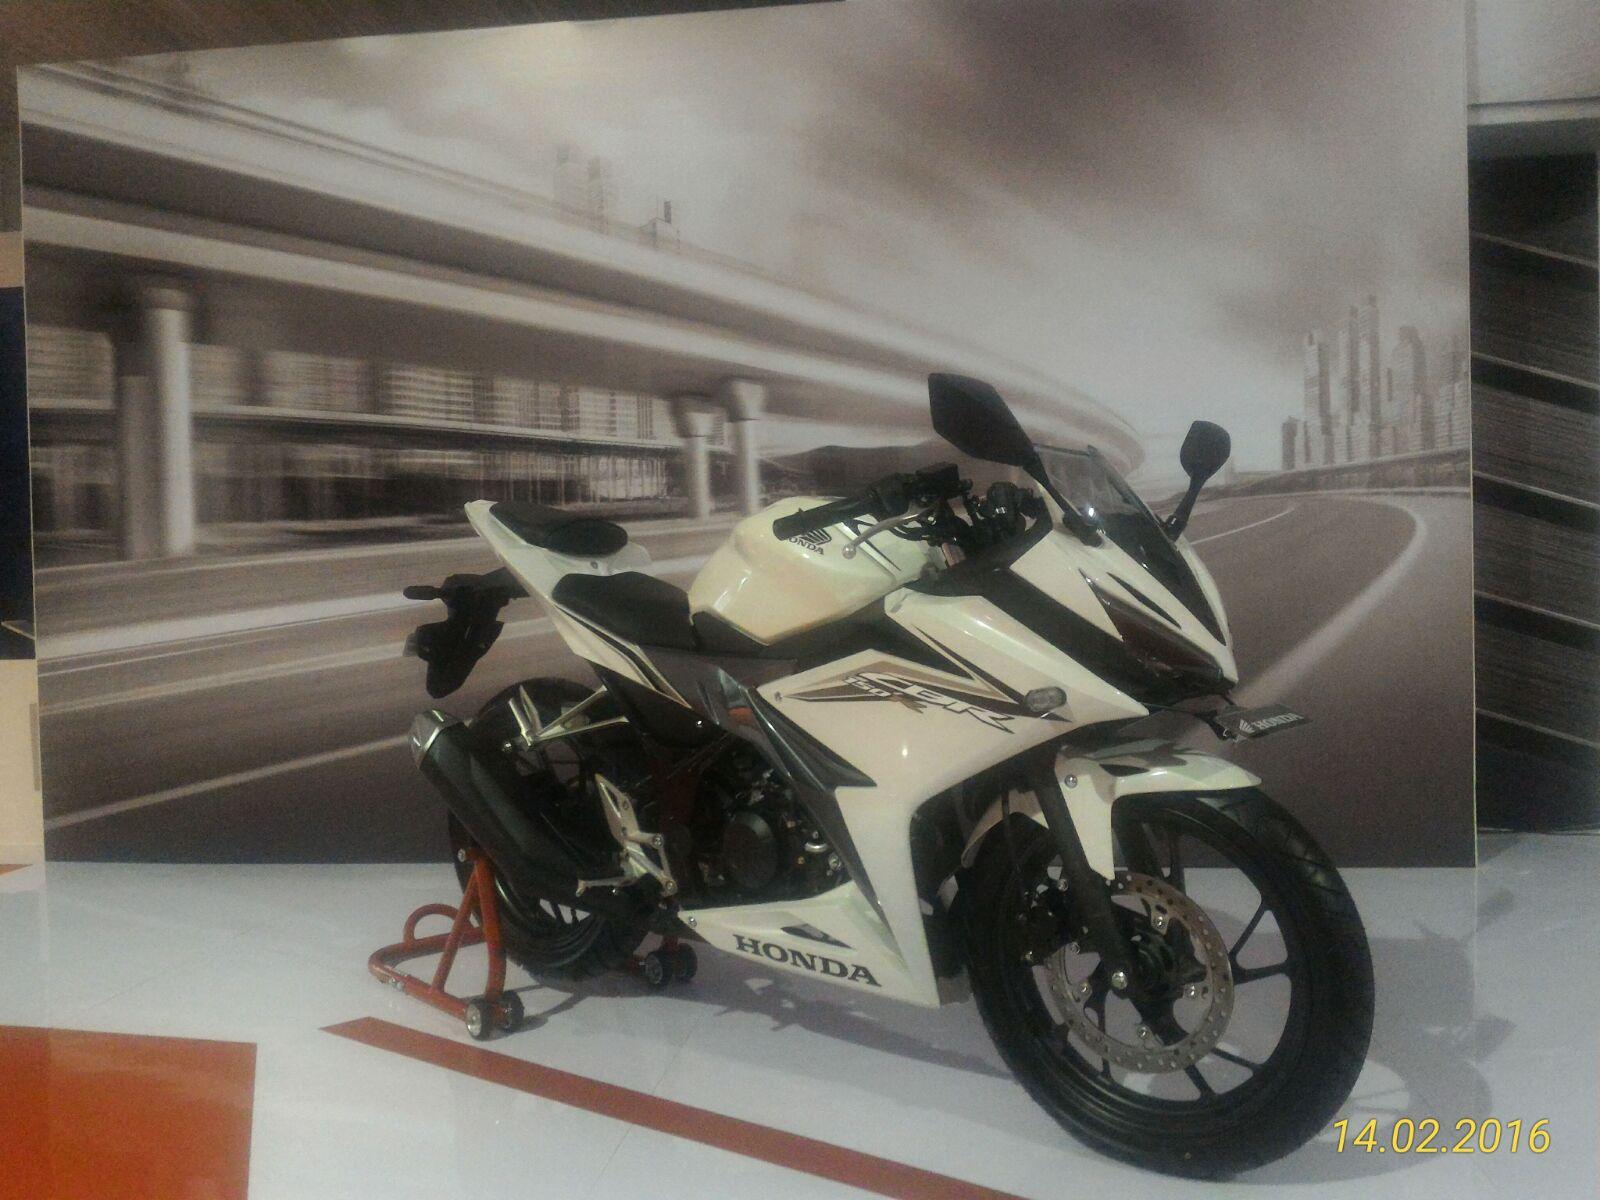 108 Modifikasi Motor Honda Cb150r Terbaru 2016 All New Cb 150r Streetfire Raptor Black Sleman Cbr 150 R 32 Jutaan